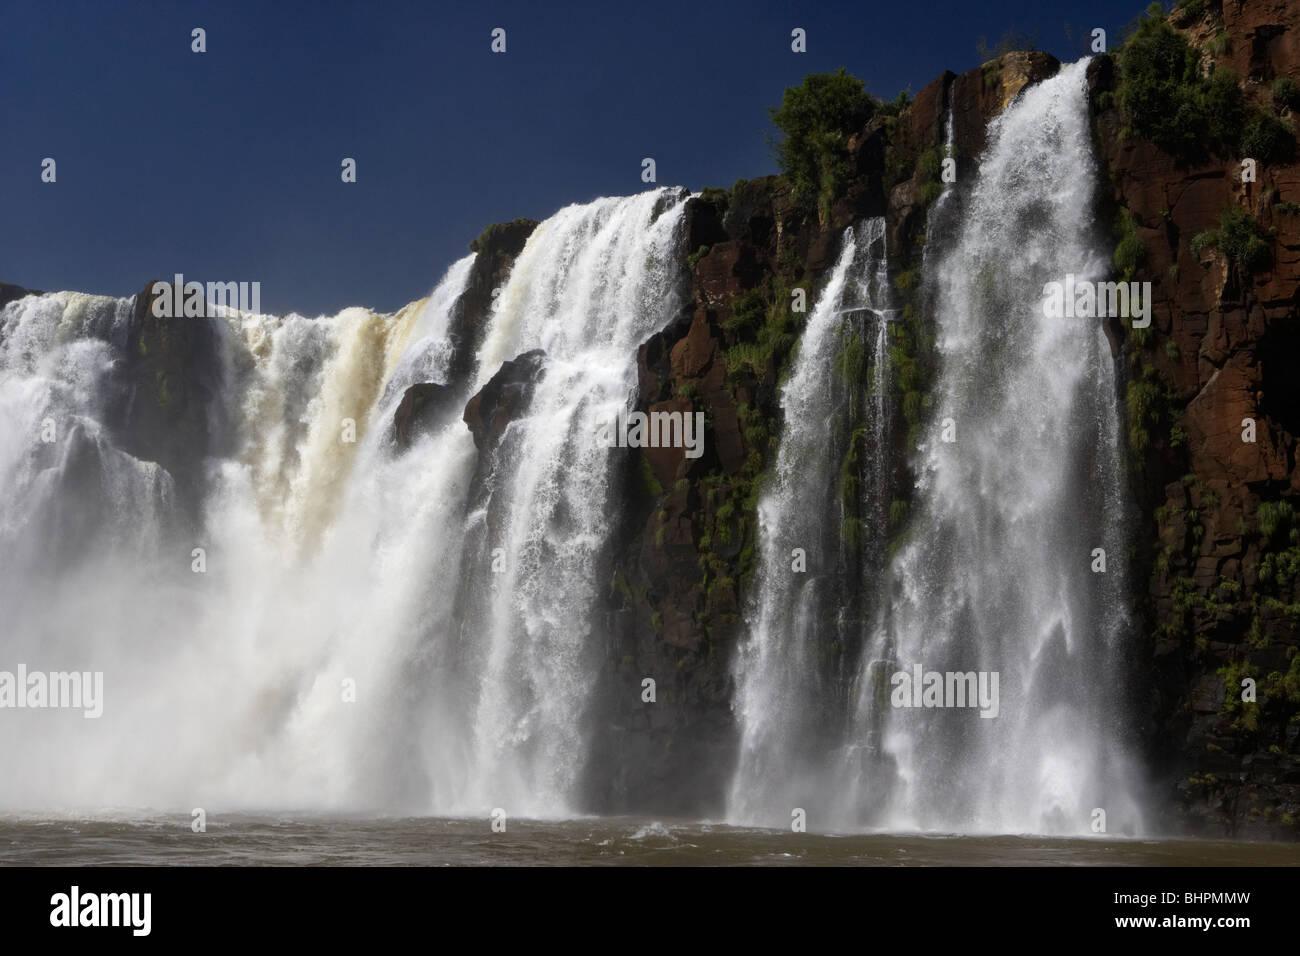 tres mosqueteros fall in iguazu falls iguazu national park, republic of argentina, south america - Stock Image